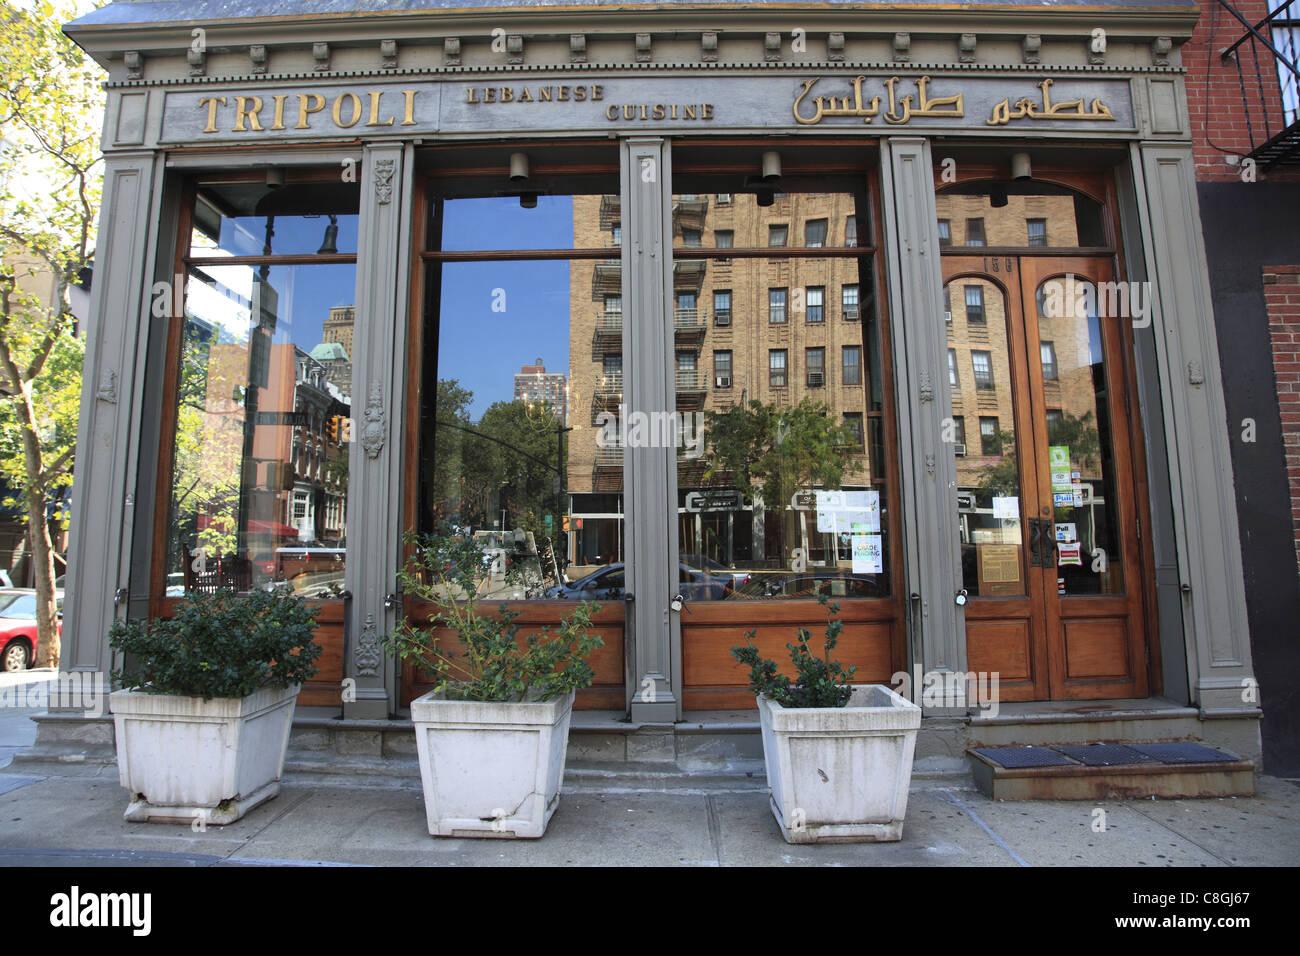 Tripoli, Lebanese Restaurant, Middle Eastern section of Atlantic Avenue, Cobble Hill, Brooklyn, New York City, USA - Stock Image